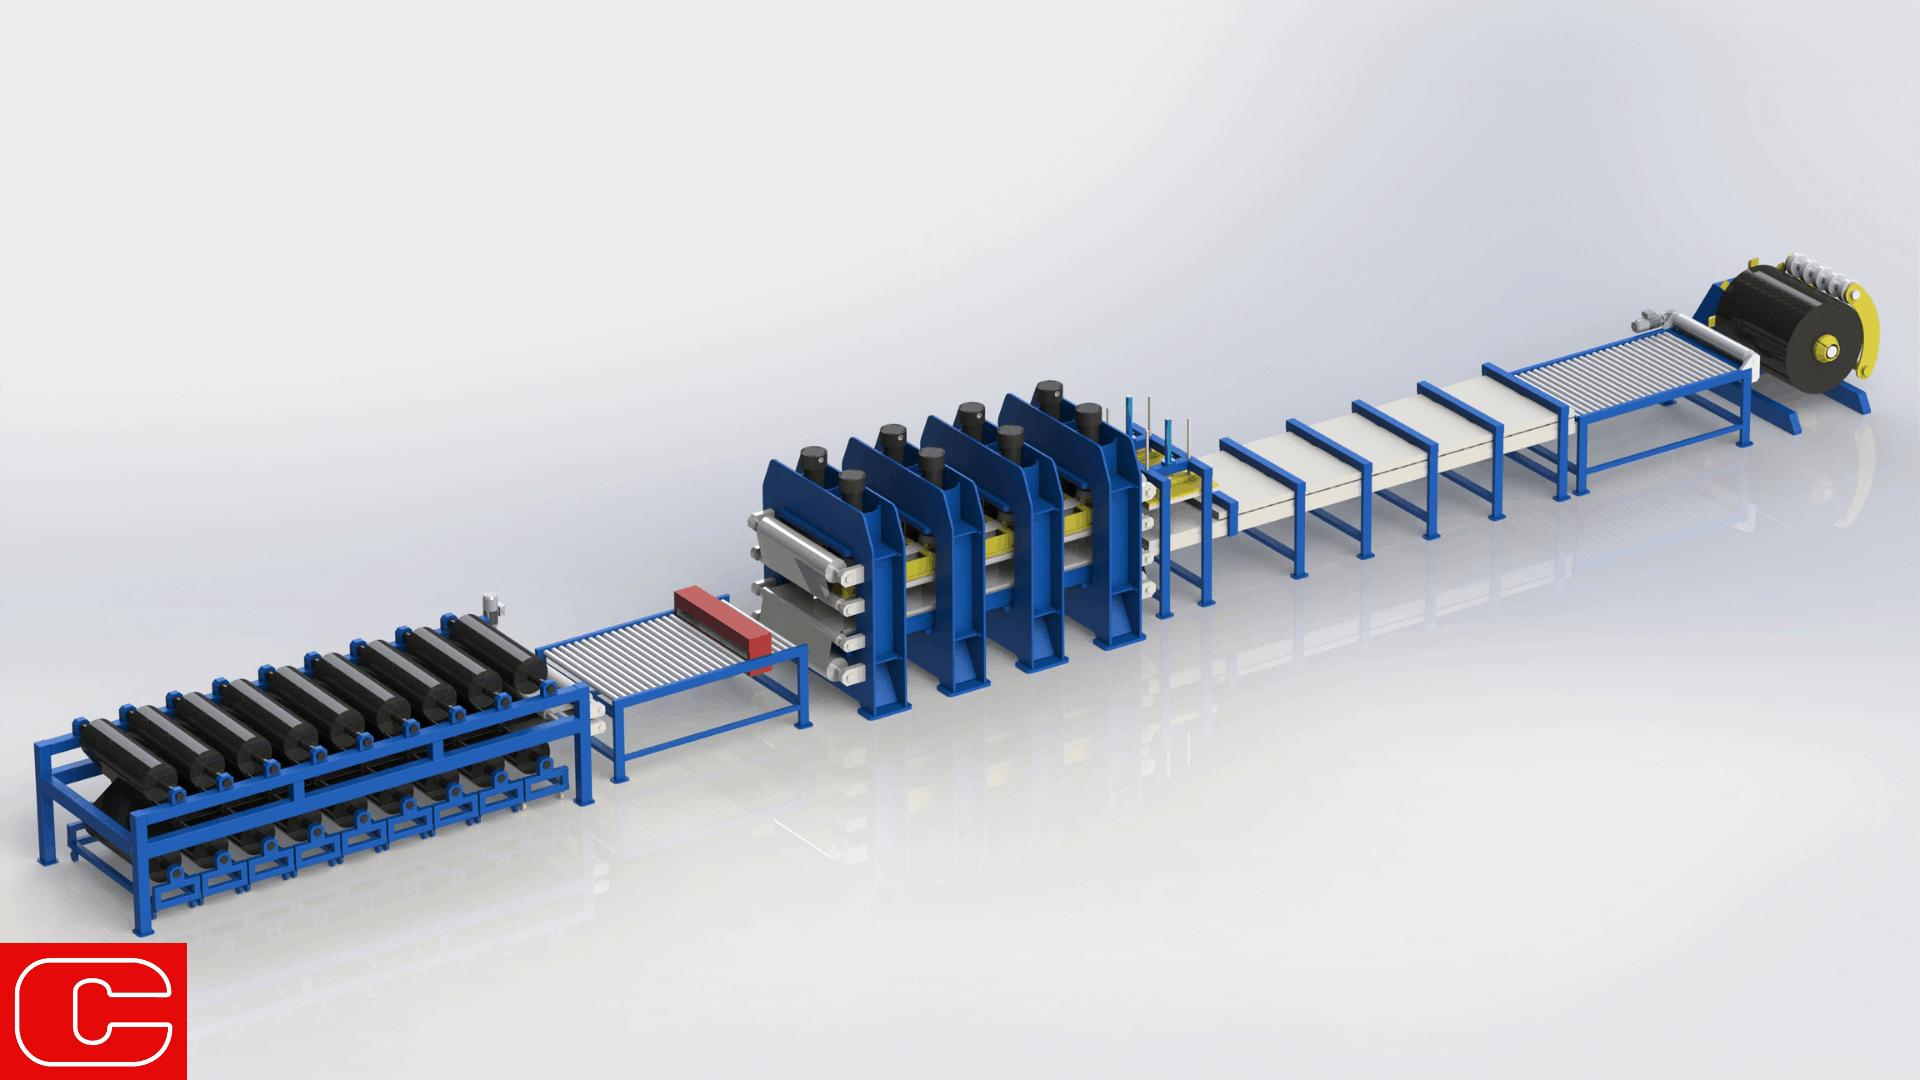 Cannon Plant for thin composite laminates continuous production